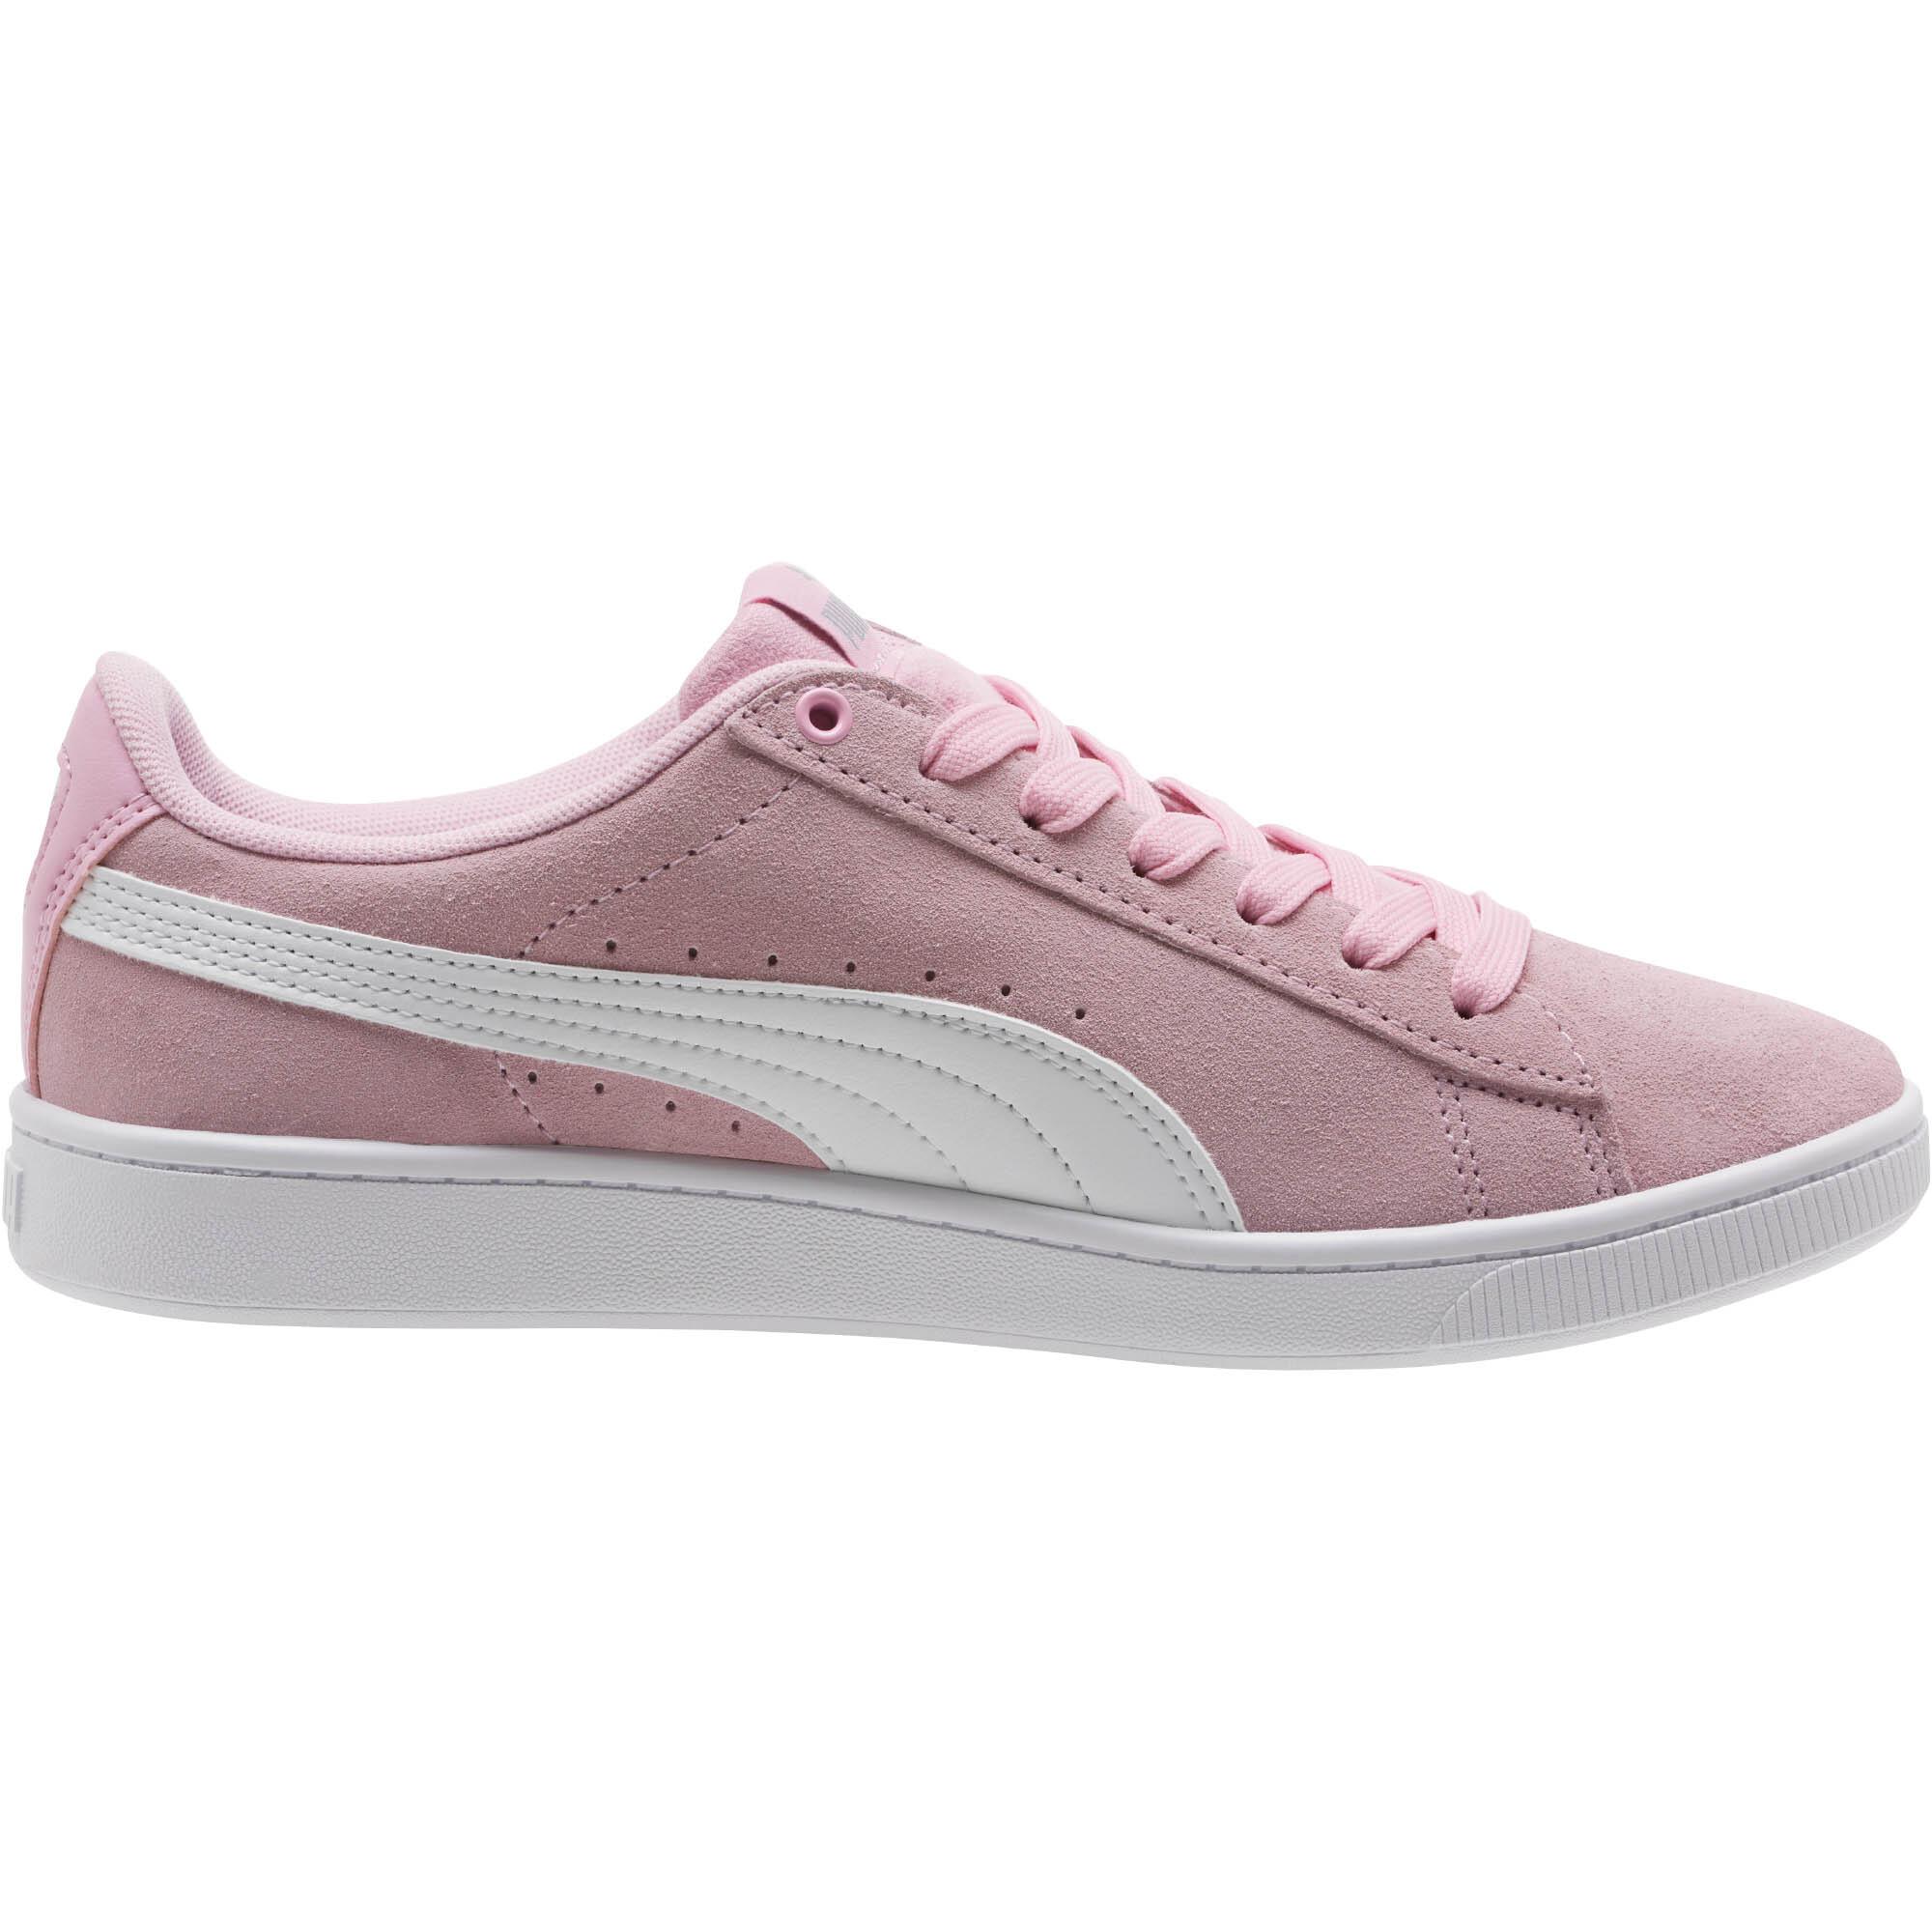 Image Puma PUMA Vikky v2 Women's Sneakers #4